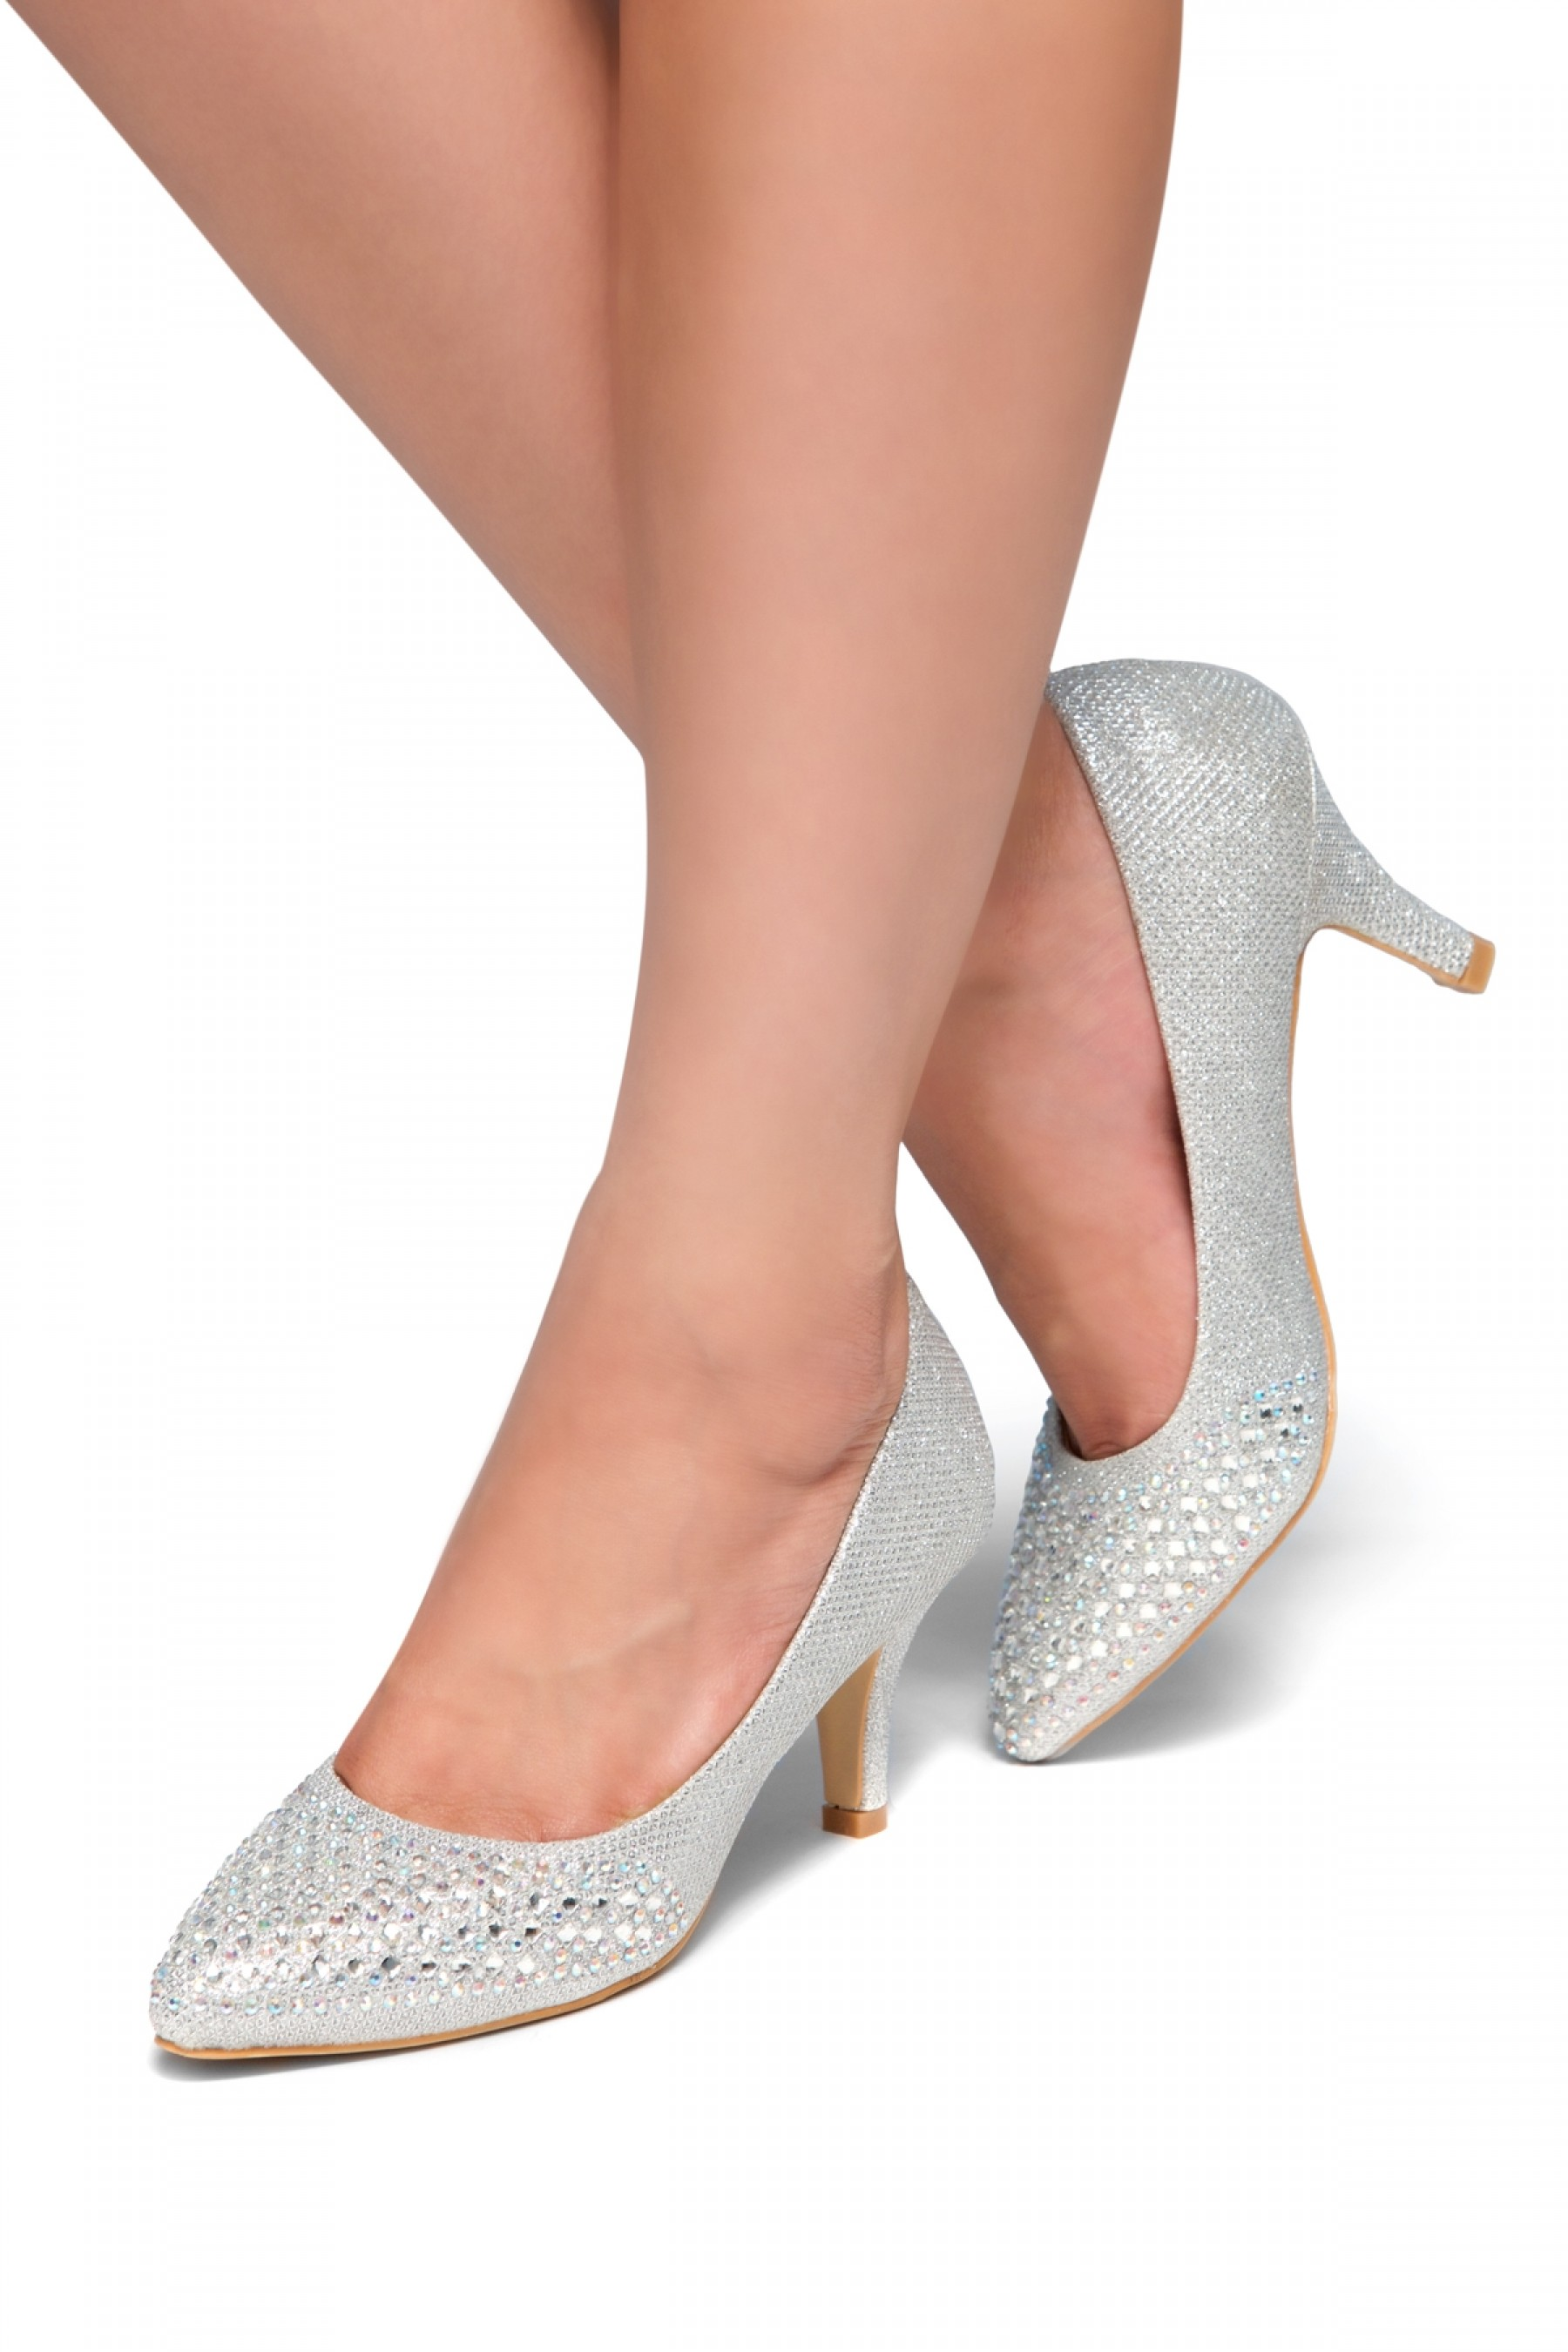 HerStyle Olivarra-Kitten heel, jeweled embellishments(Silver)